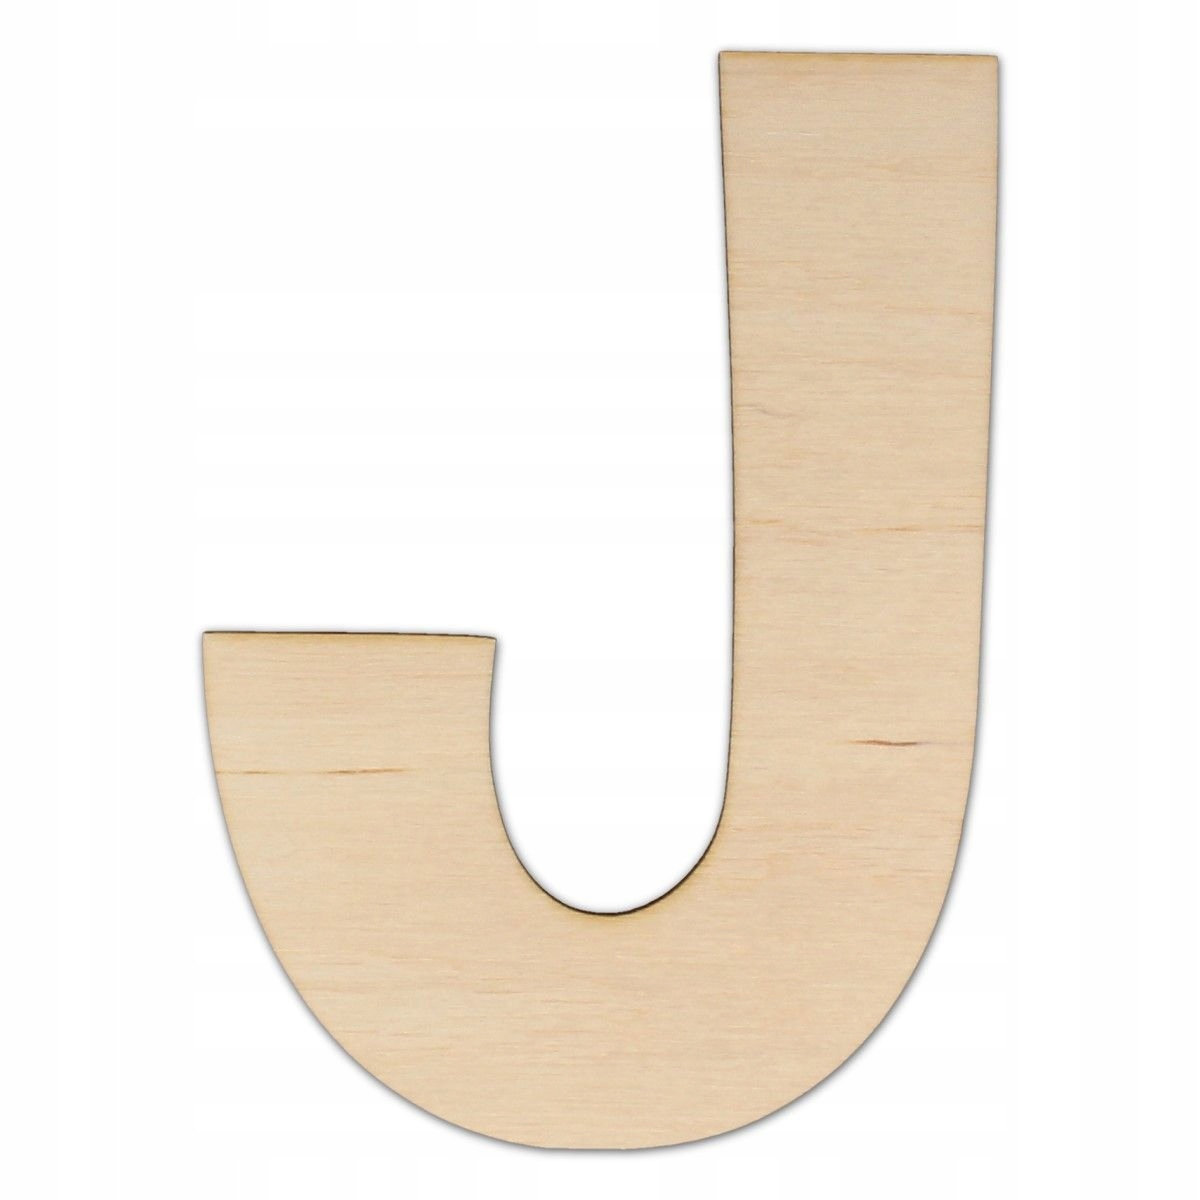 Ld J Litera J 145 Cm 7153856572 Oficjalne Archiwum Allegro